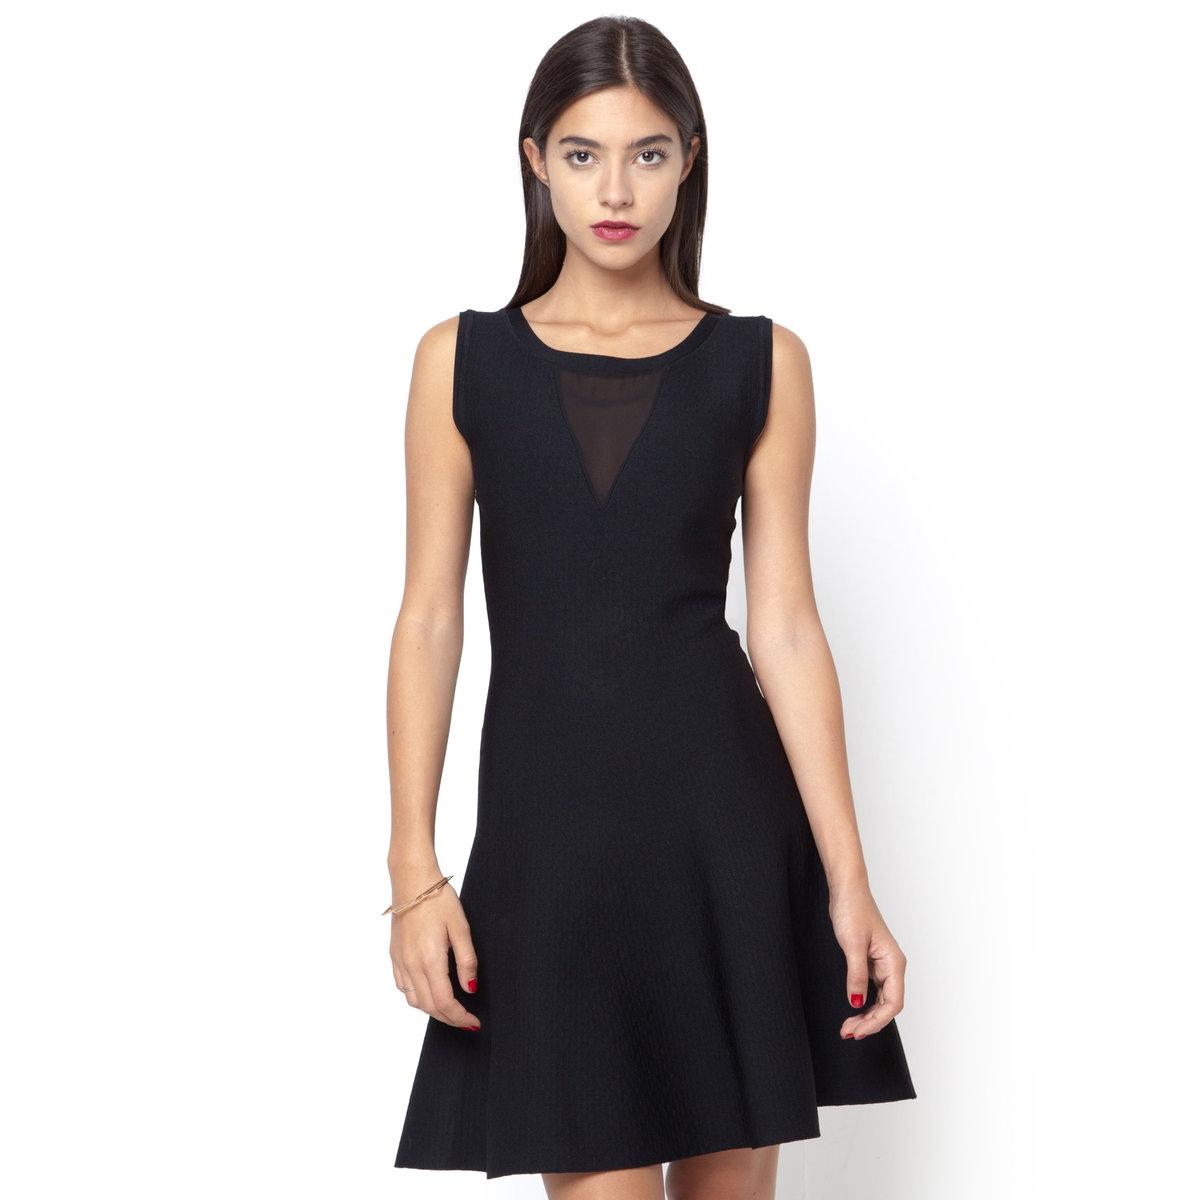 Платье<br><br>Цвет: черный<br>Размер: 2(M)